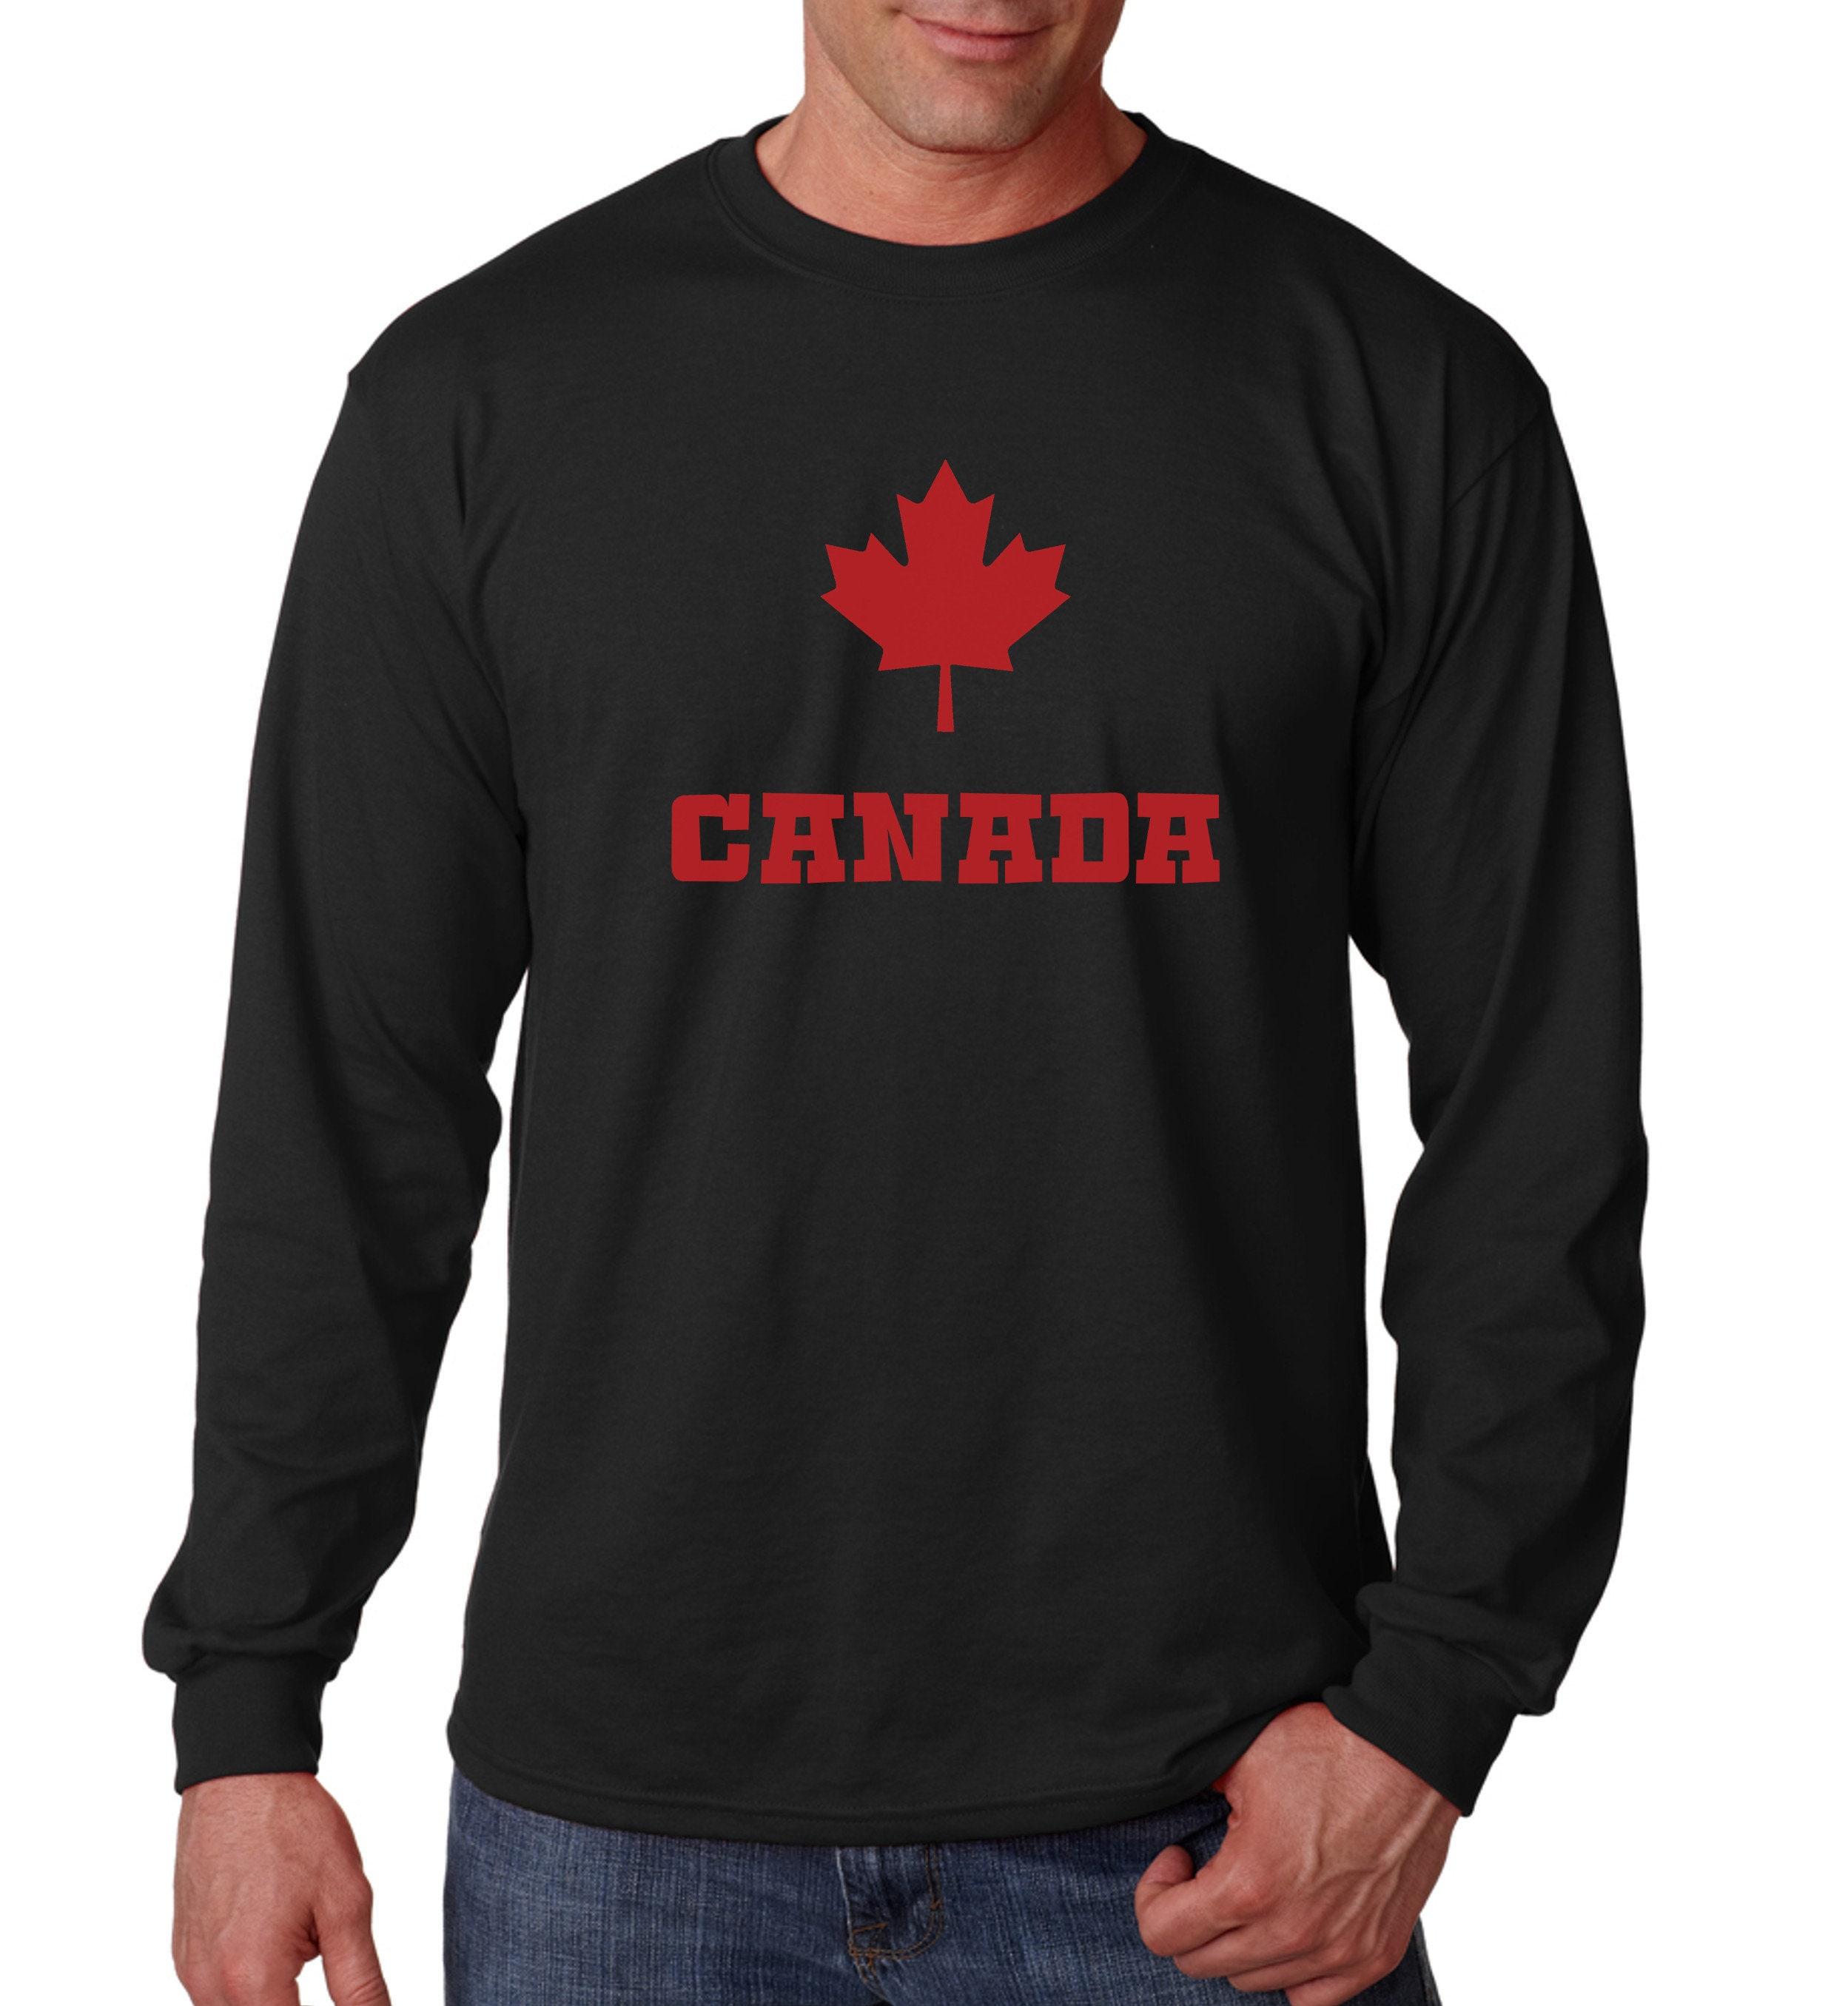 Long Sleeve Canadian Maple Leaf Shirt Canada Pride National